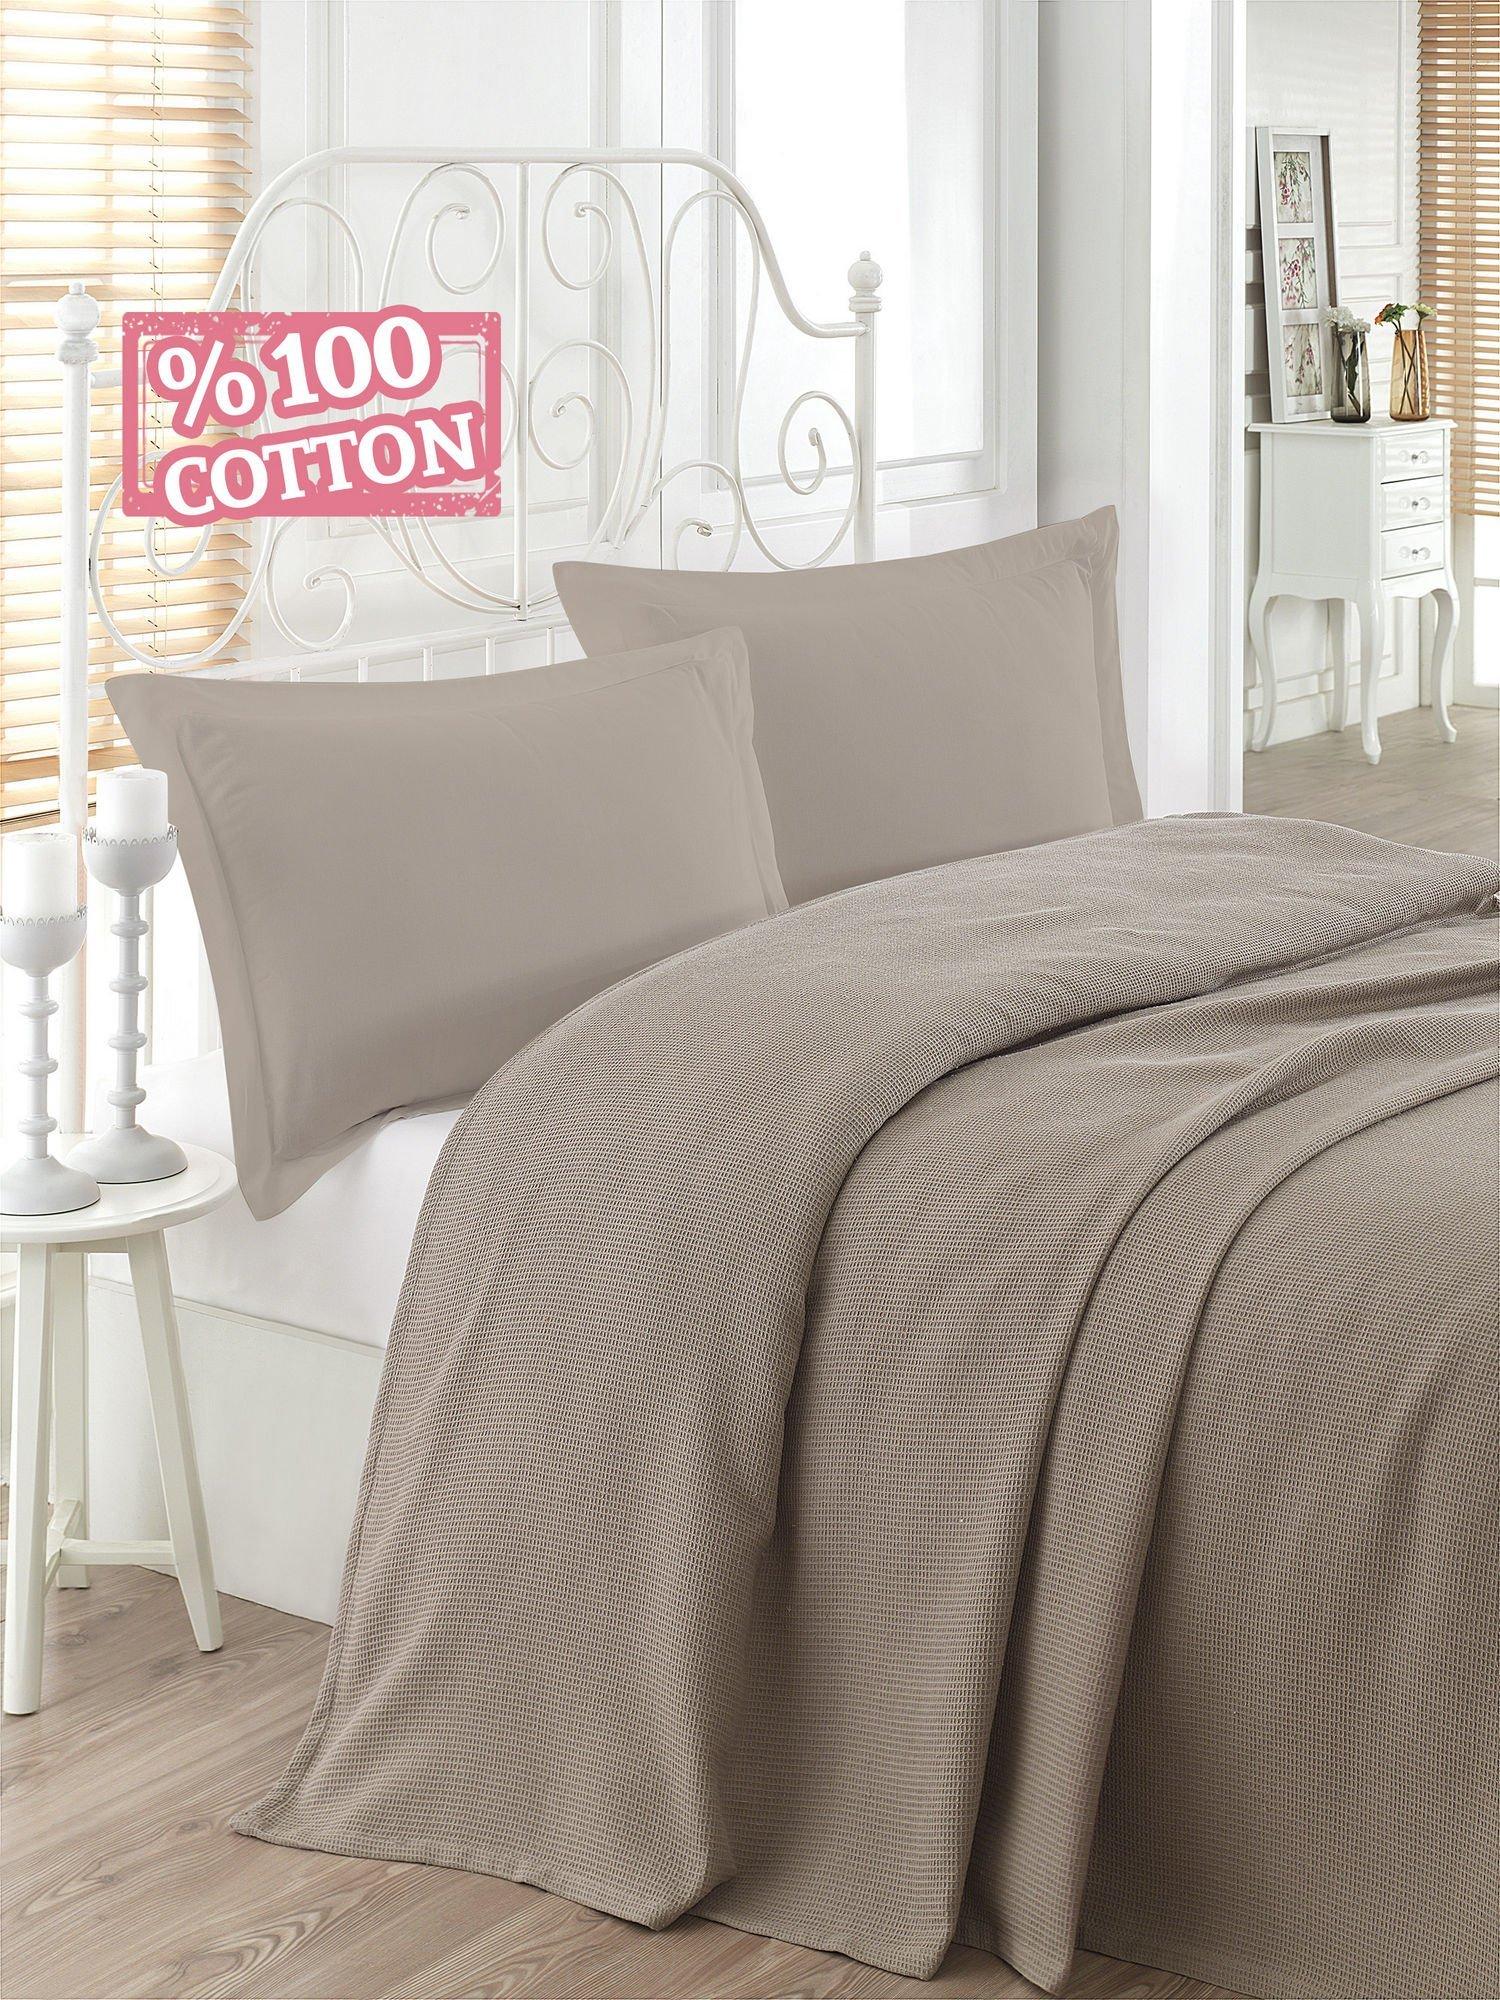 LaModaHome Colors Coverlet, 100% Cotton - Beige Color, Light Brown, Plain 1 Colored, Rough - Size (63'' x 90.6'') for Single Bed